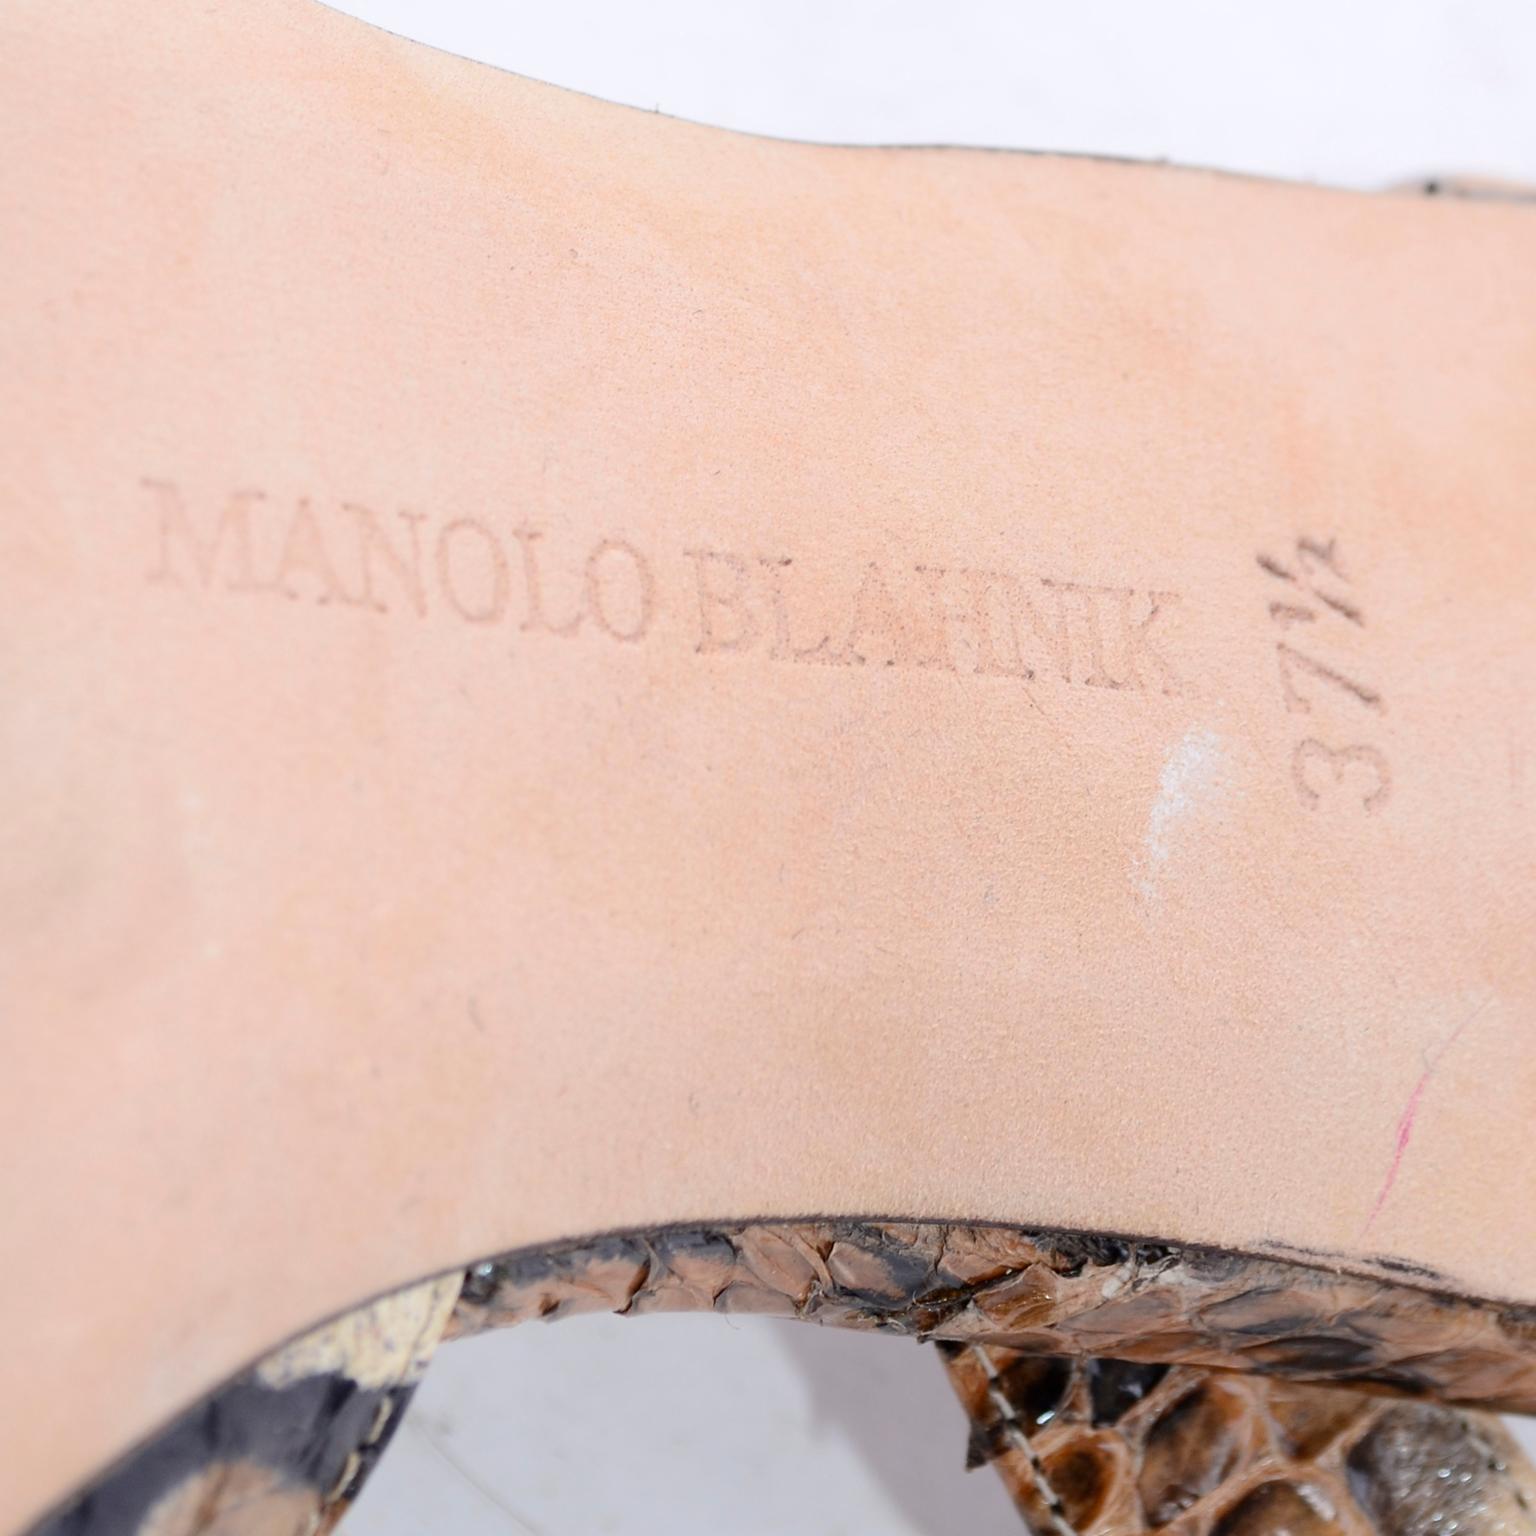 b161b2dbdffbe Manolo Blahnik Shoes in Size 37.5 Leopard Print Snakeskin Slingback Heels  at 1stdibs